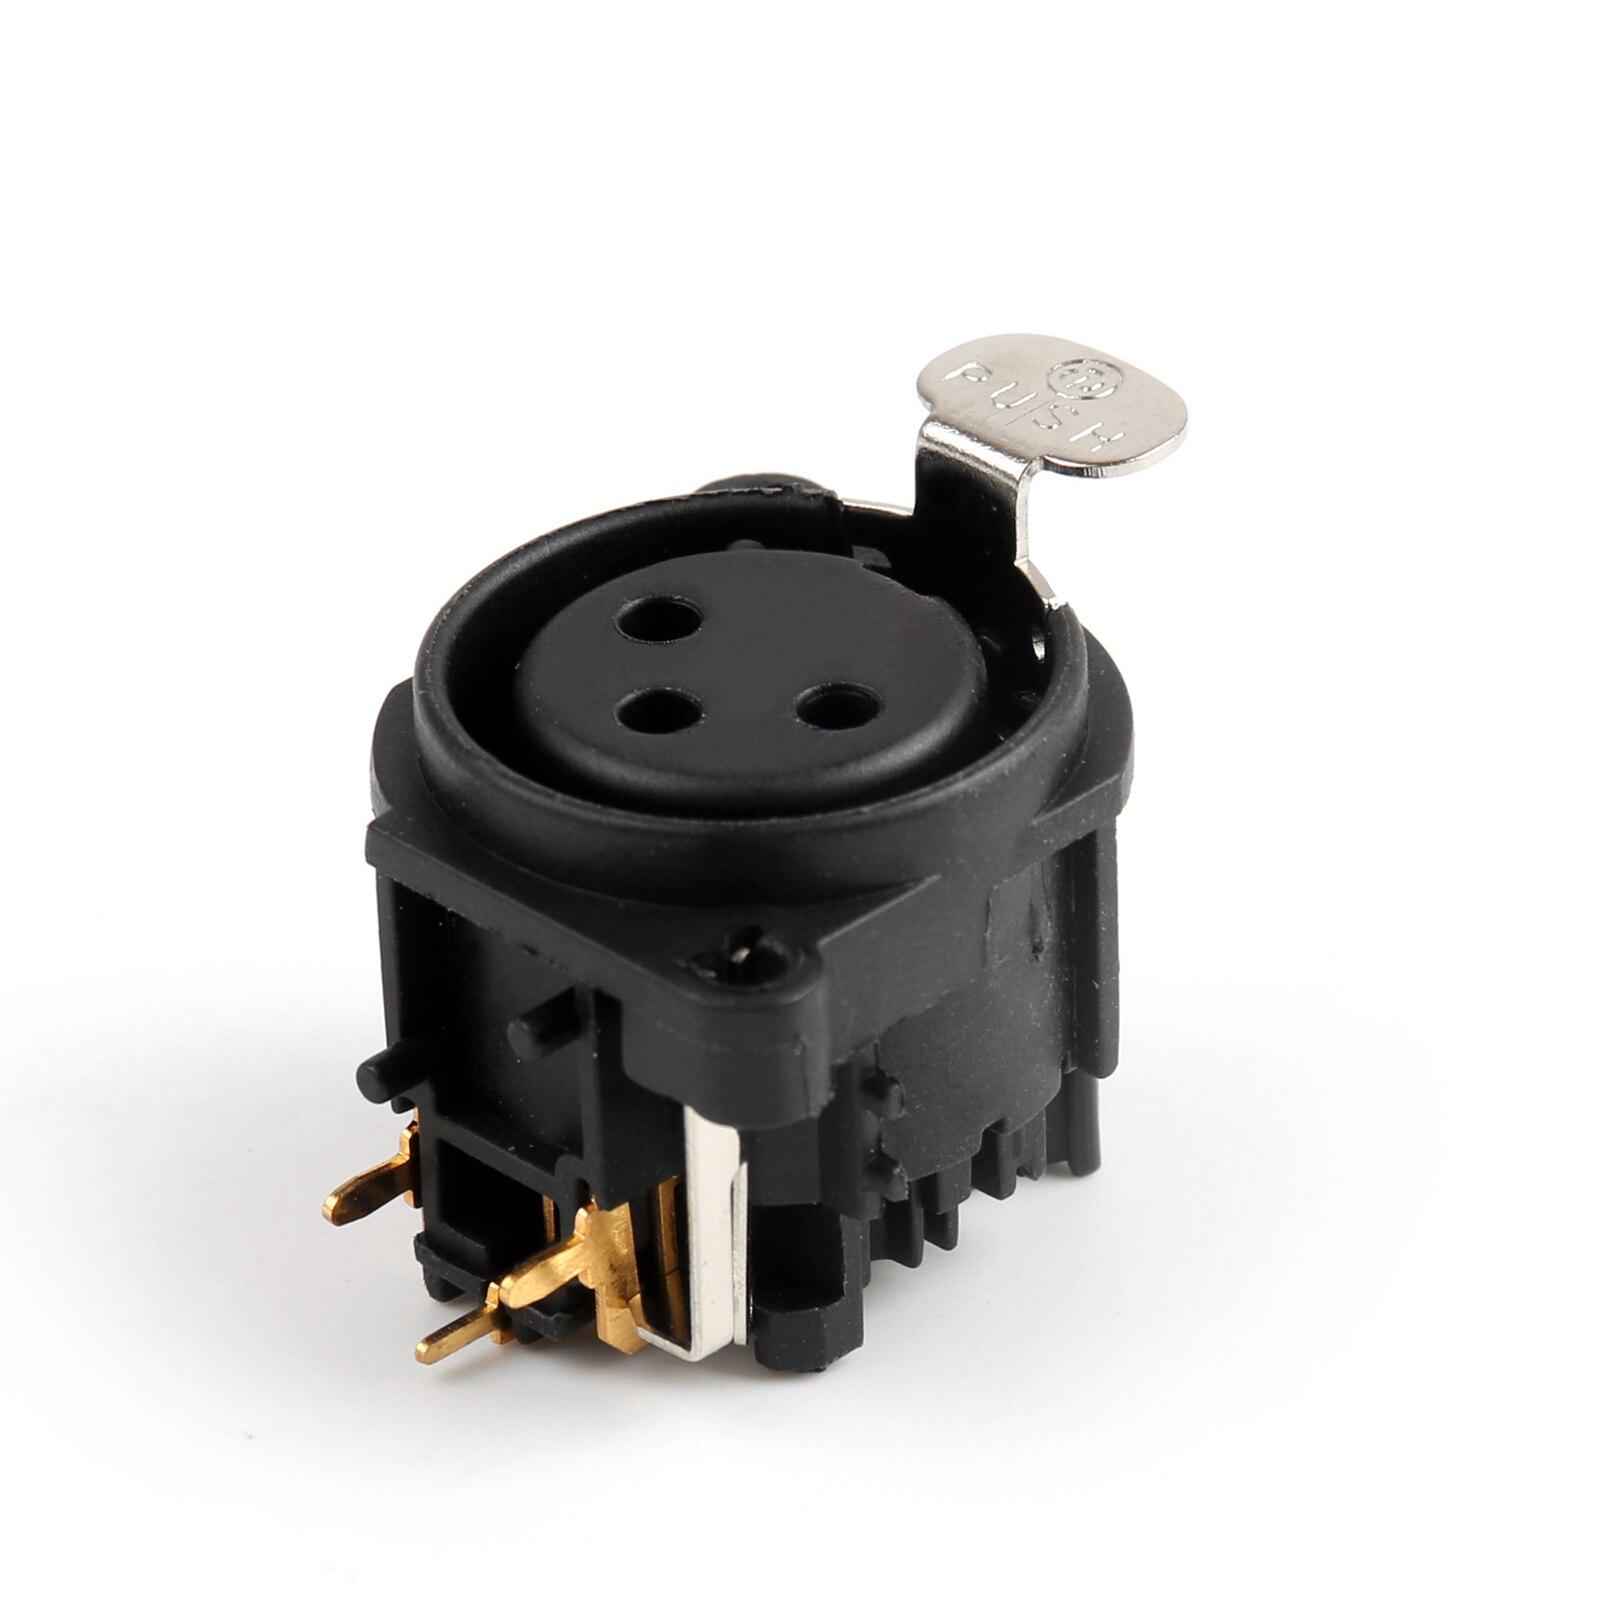 Artudatech-موصل لوحة PCB ، 3 أقطاب ، للميكروفون ، الجيتار ، XLR ، أنثى ، 100 قطعة